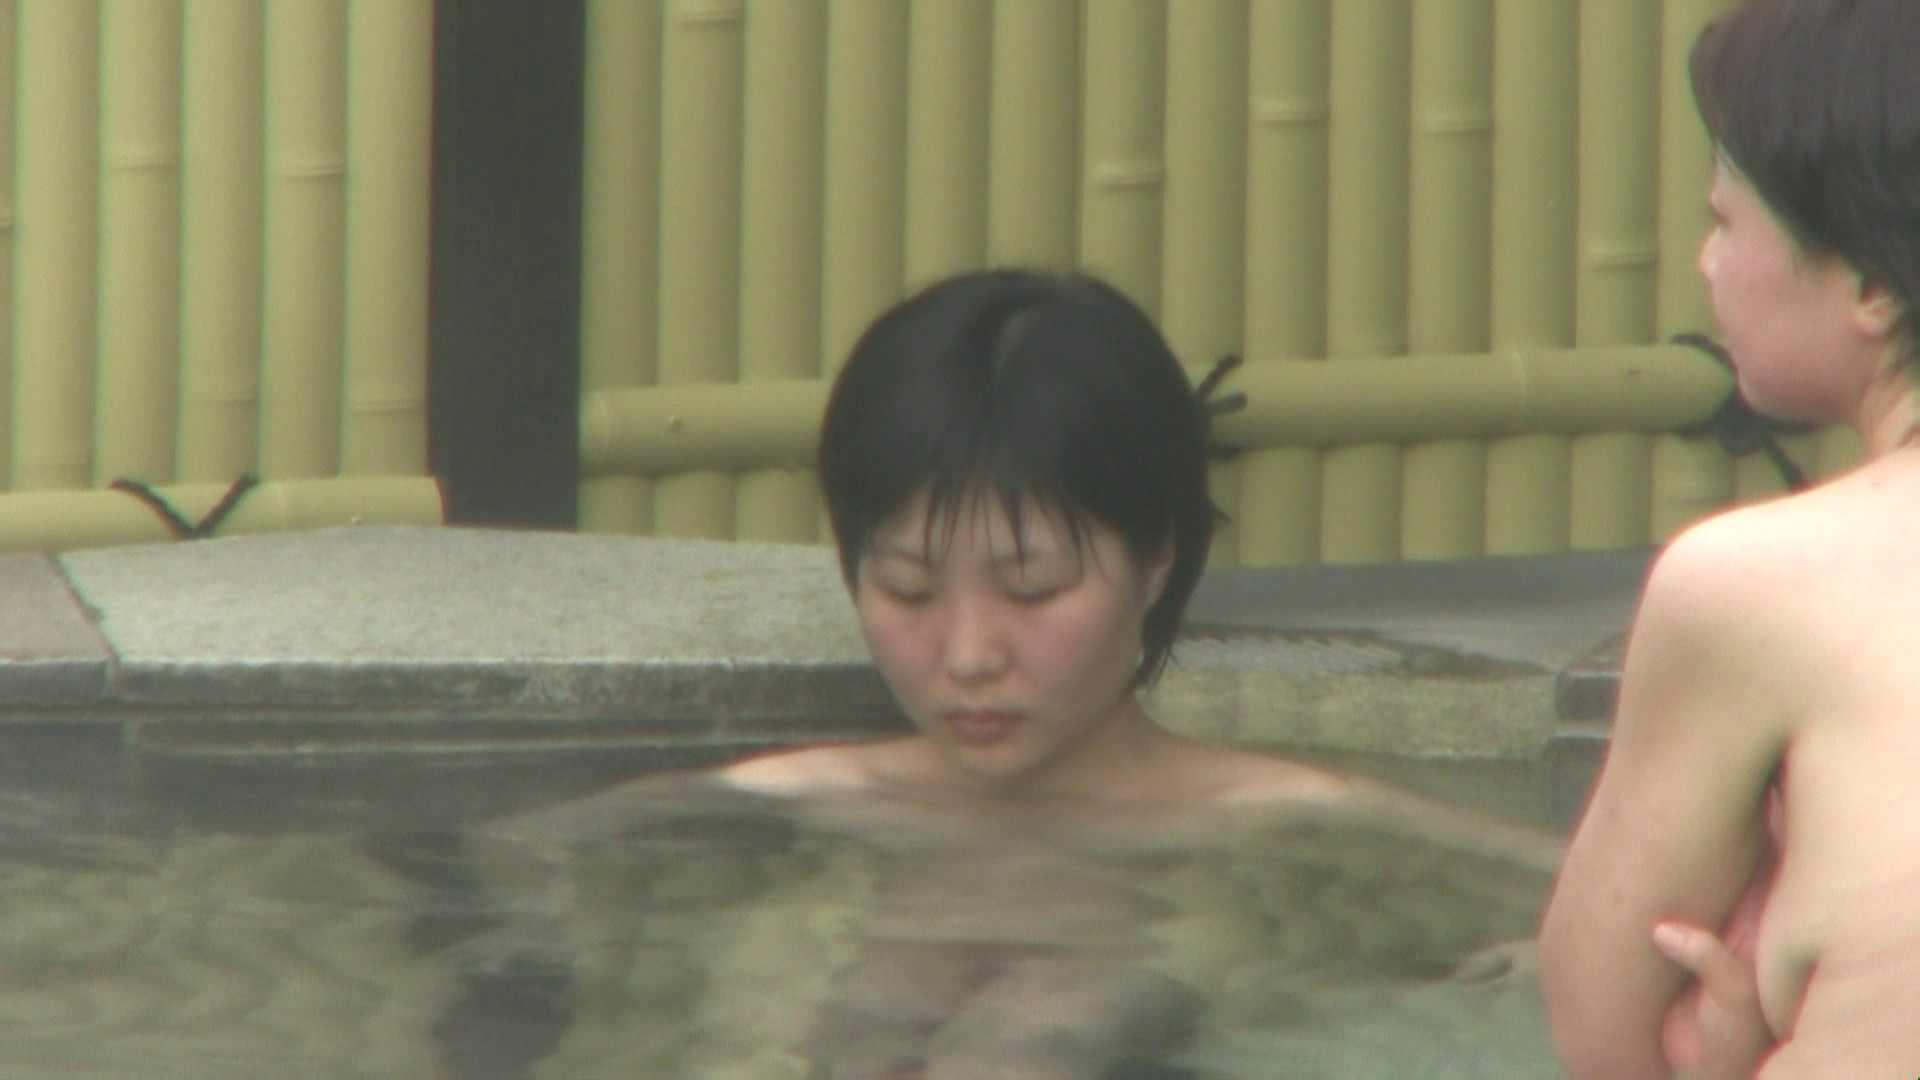 Aquaな露天風呂Vol.74【VIP限定】 盗撮 隠し撮りオマンコ動画紹介 68画像 56